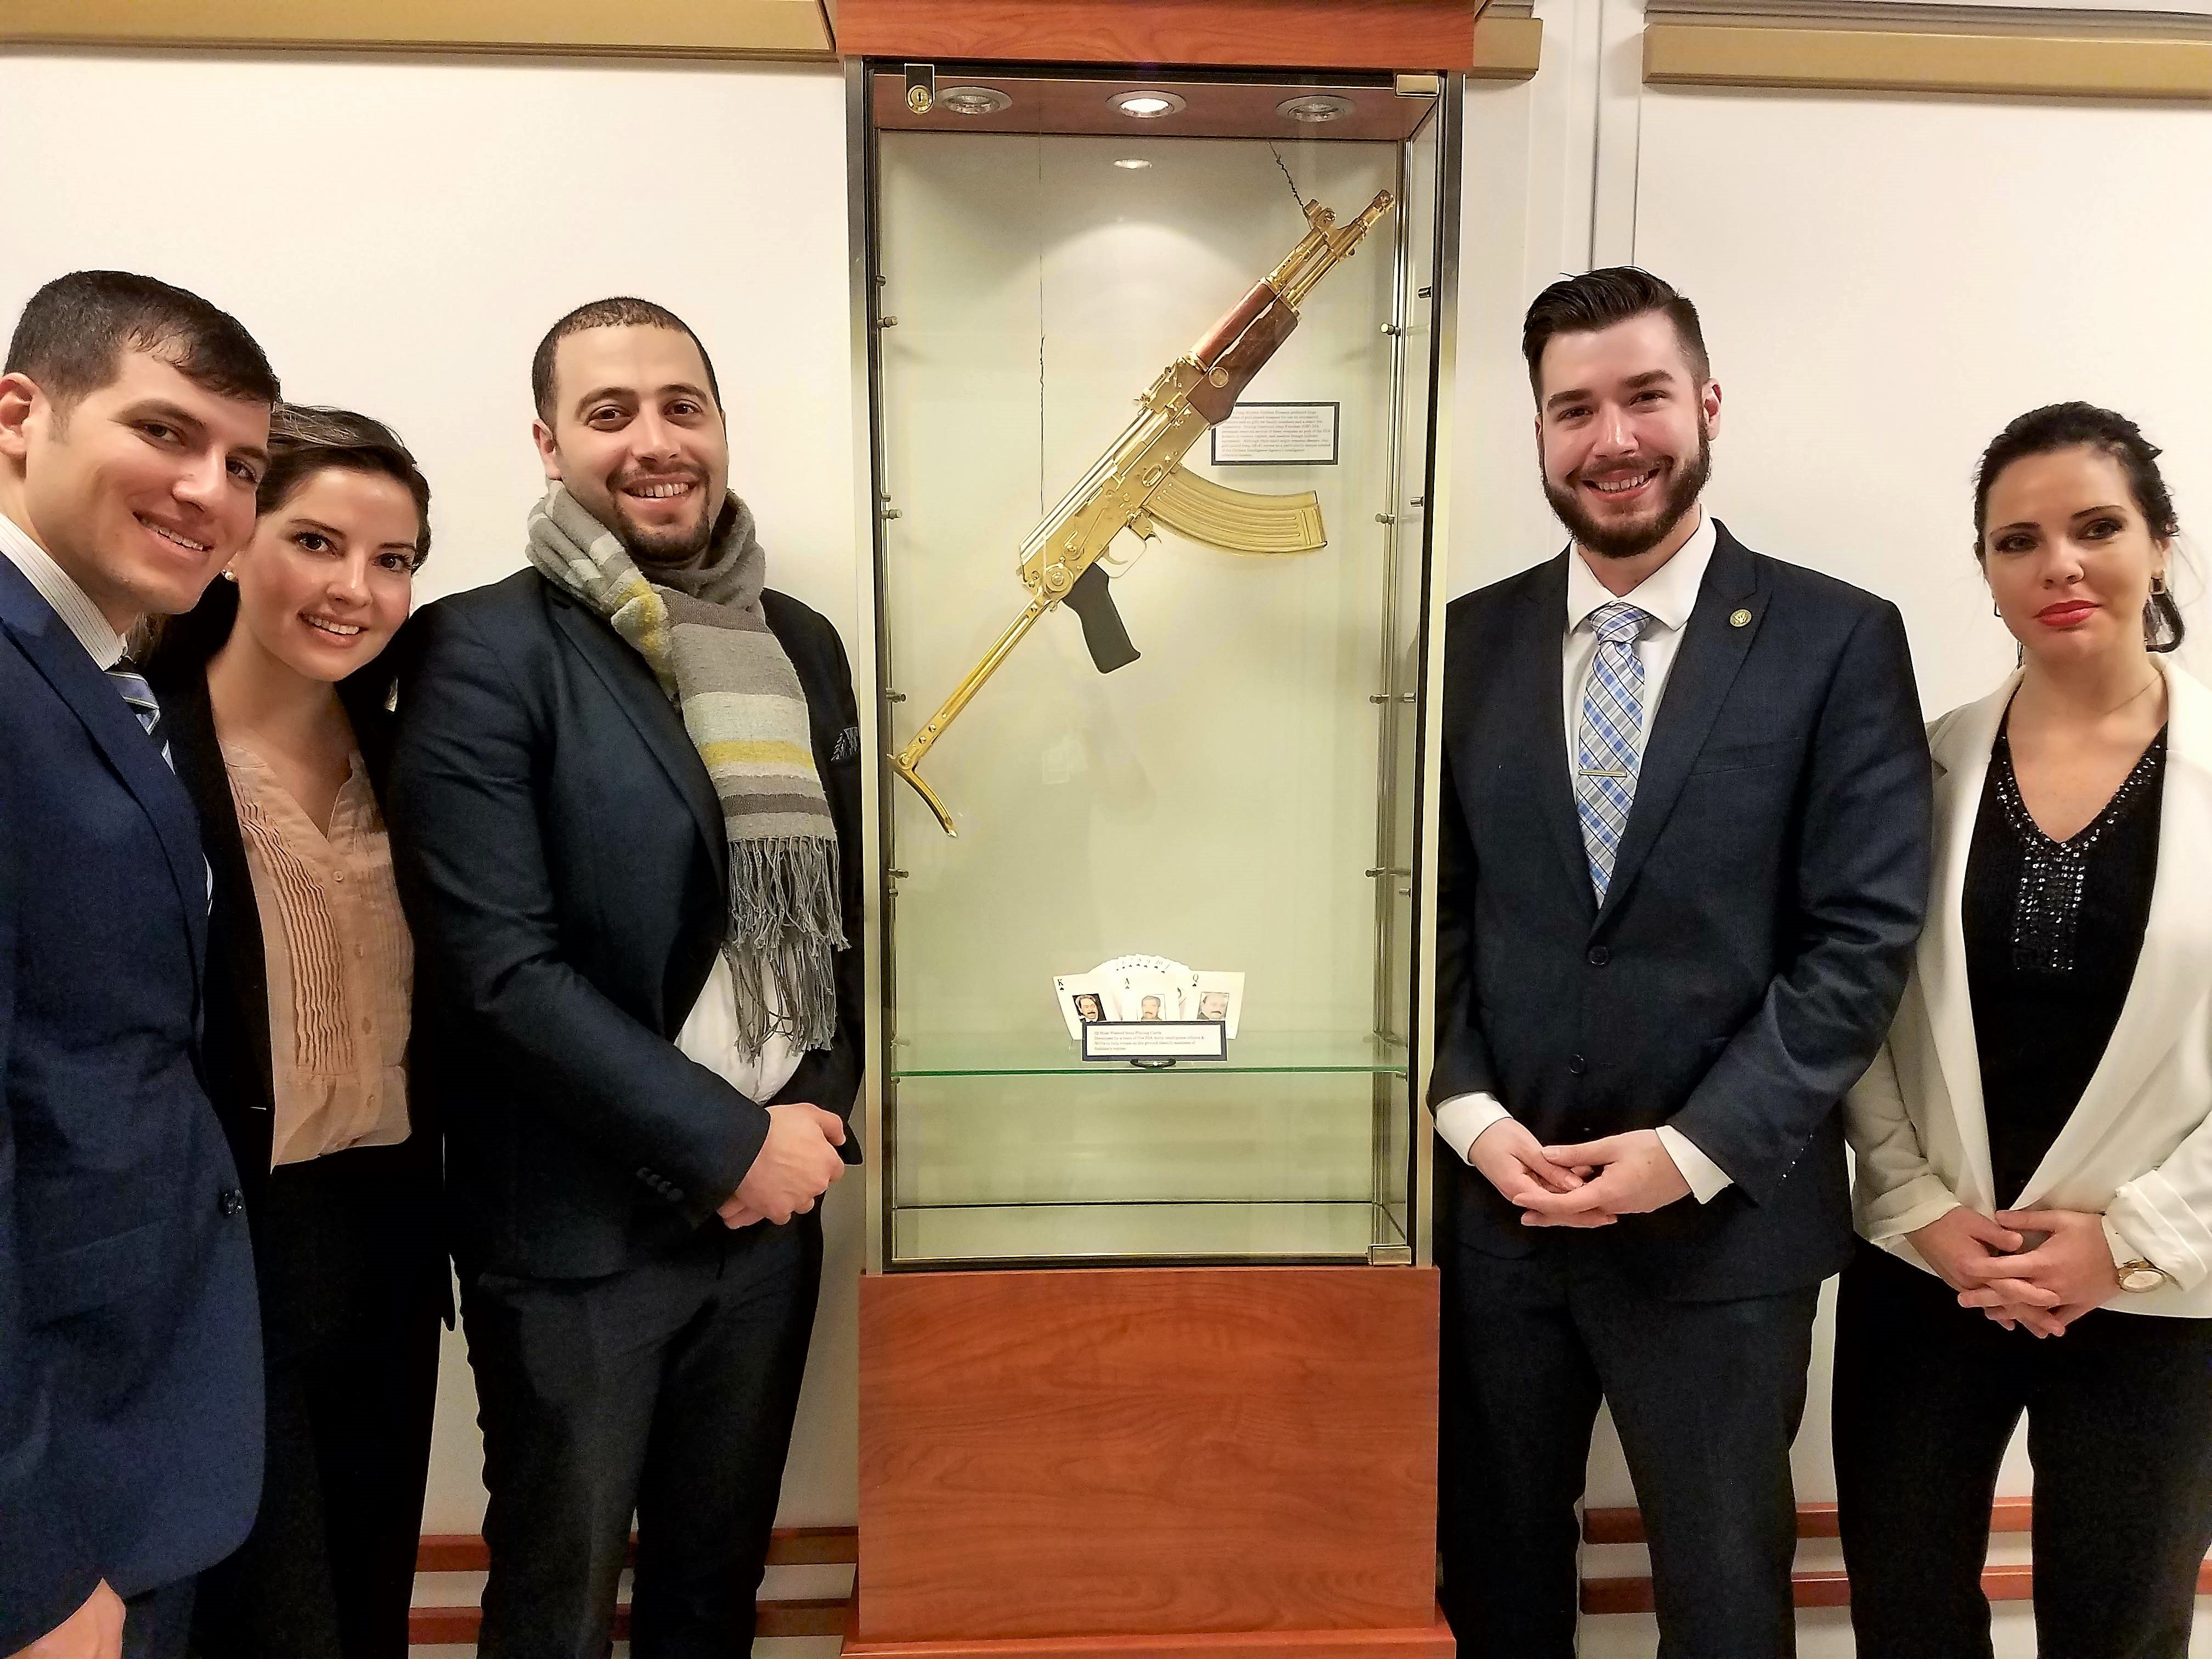 Student Ambassadors with Saddam Hussain's gold-plated Ak-47